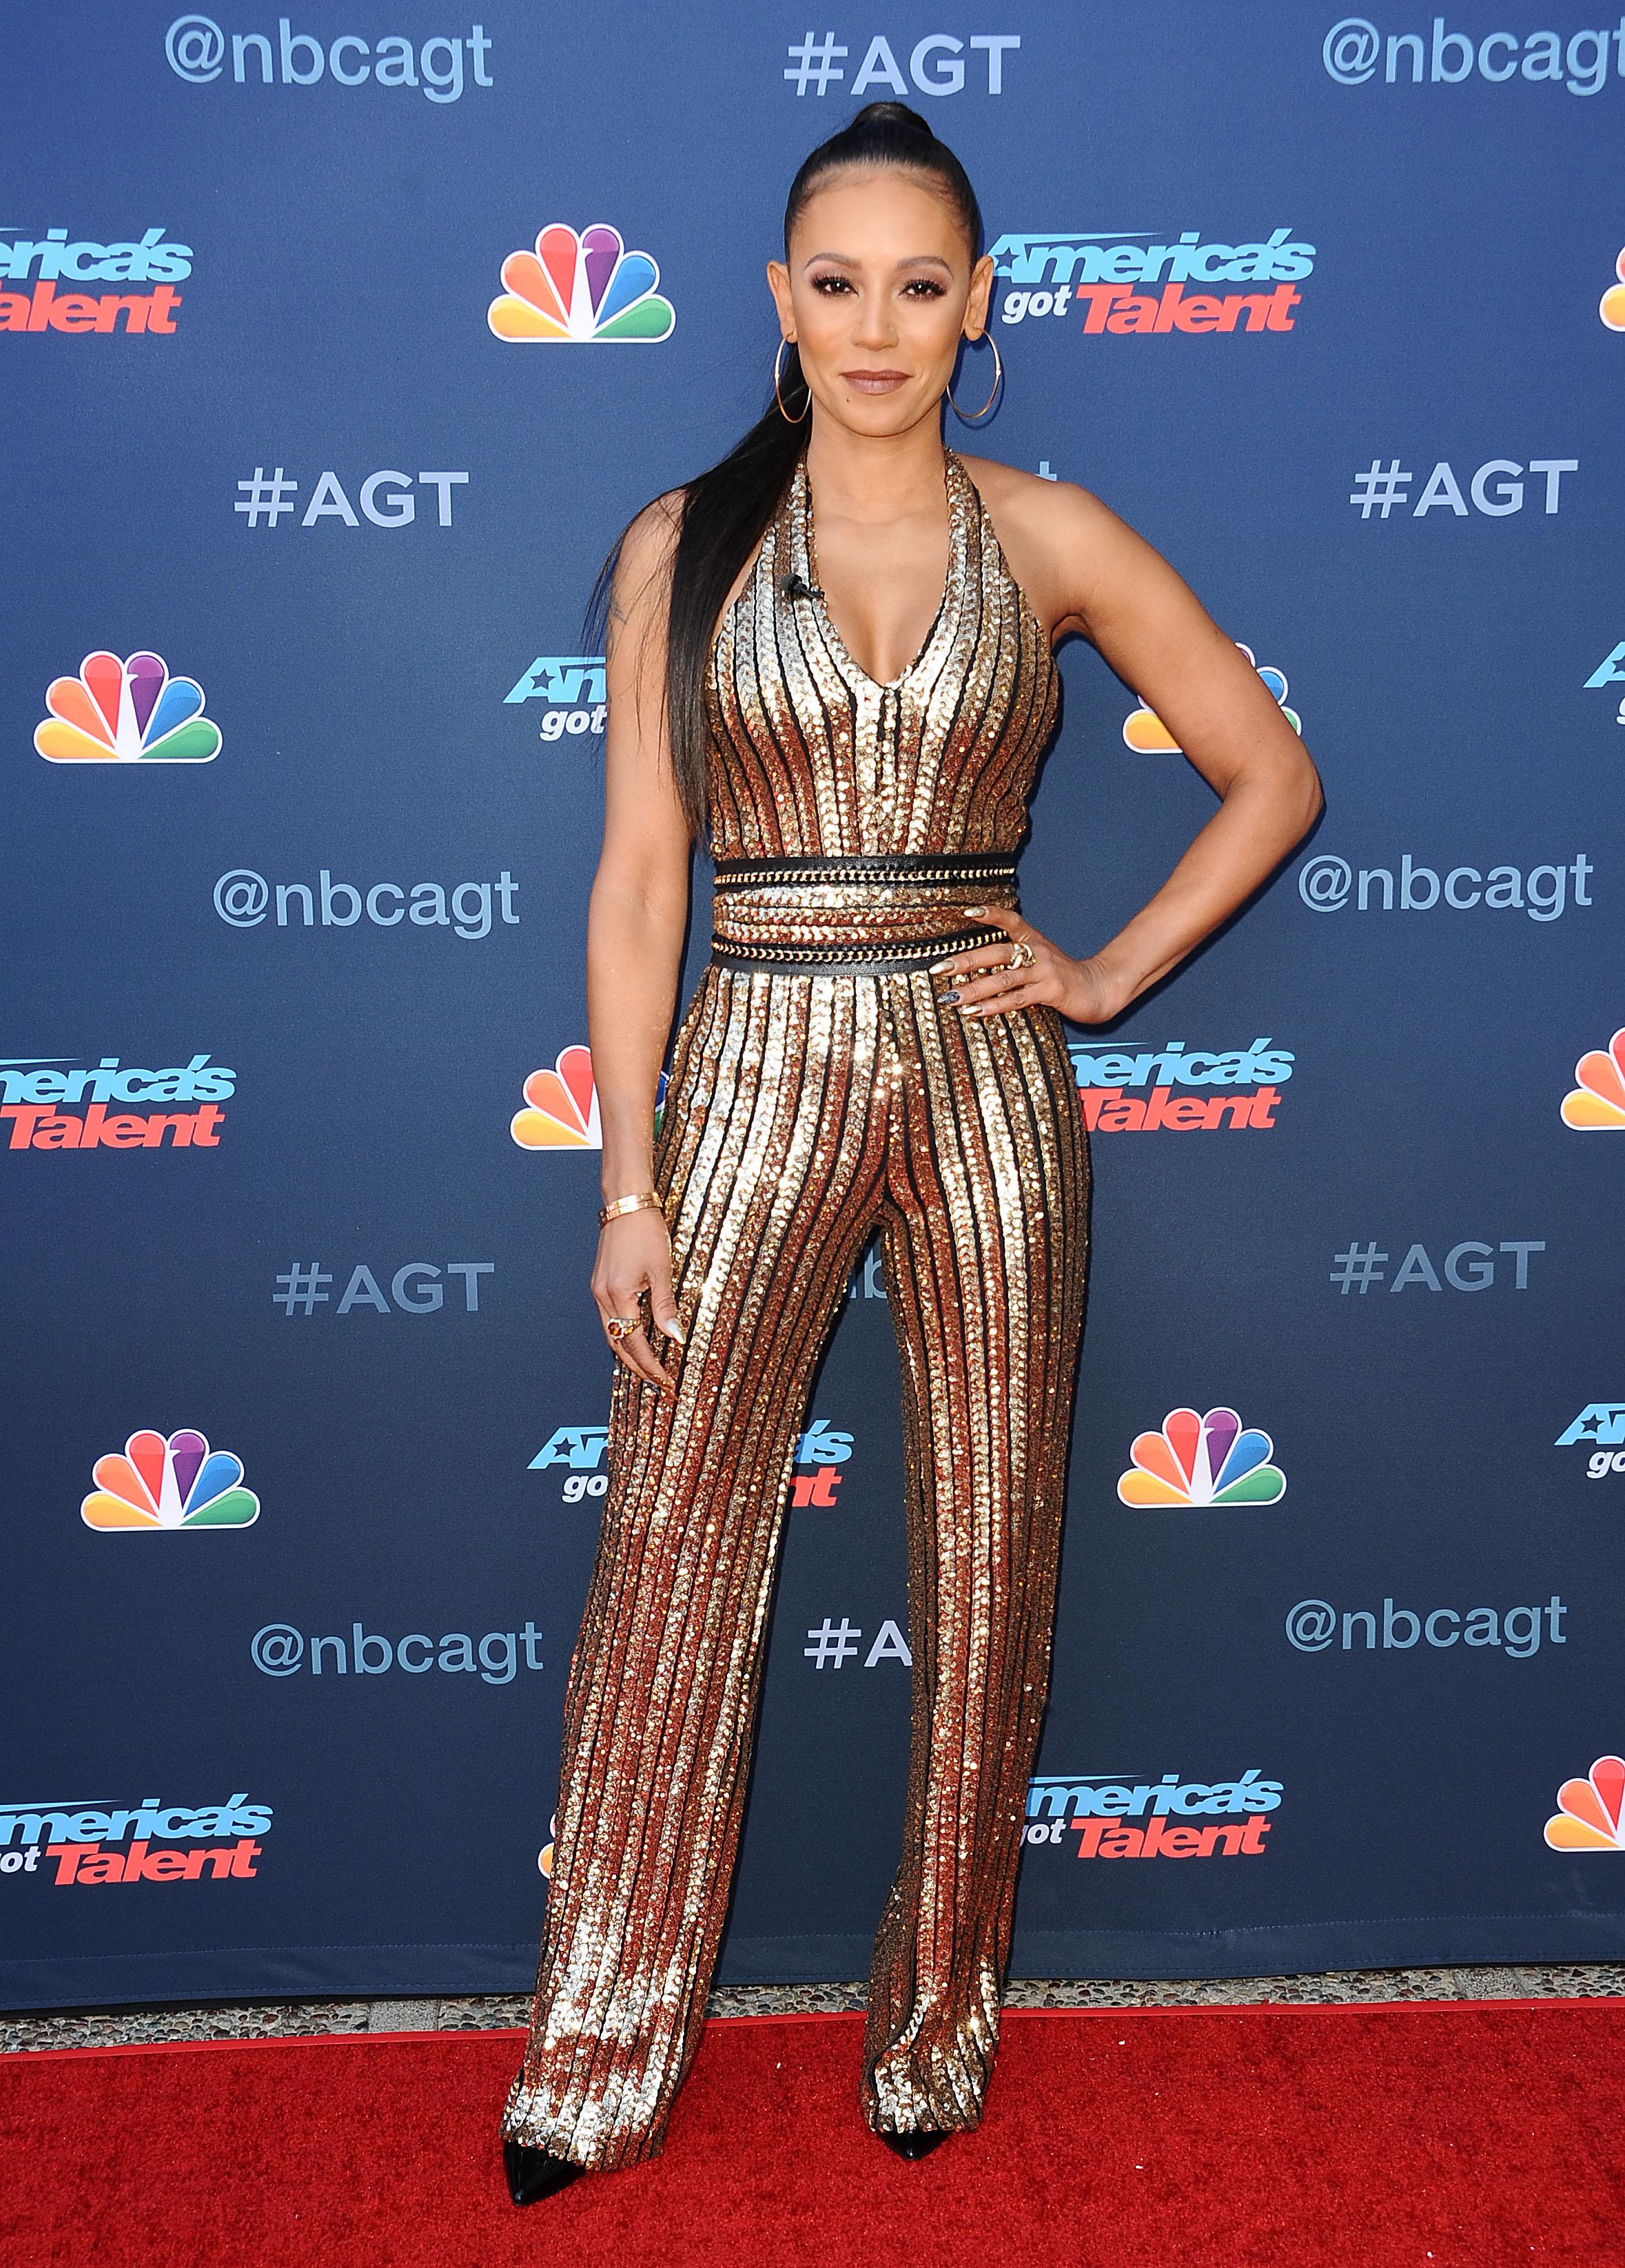 NBC's 'America's Got Talent' Season 12 Kickoff - Arrivals